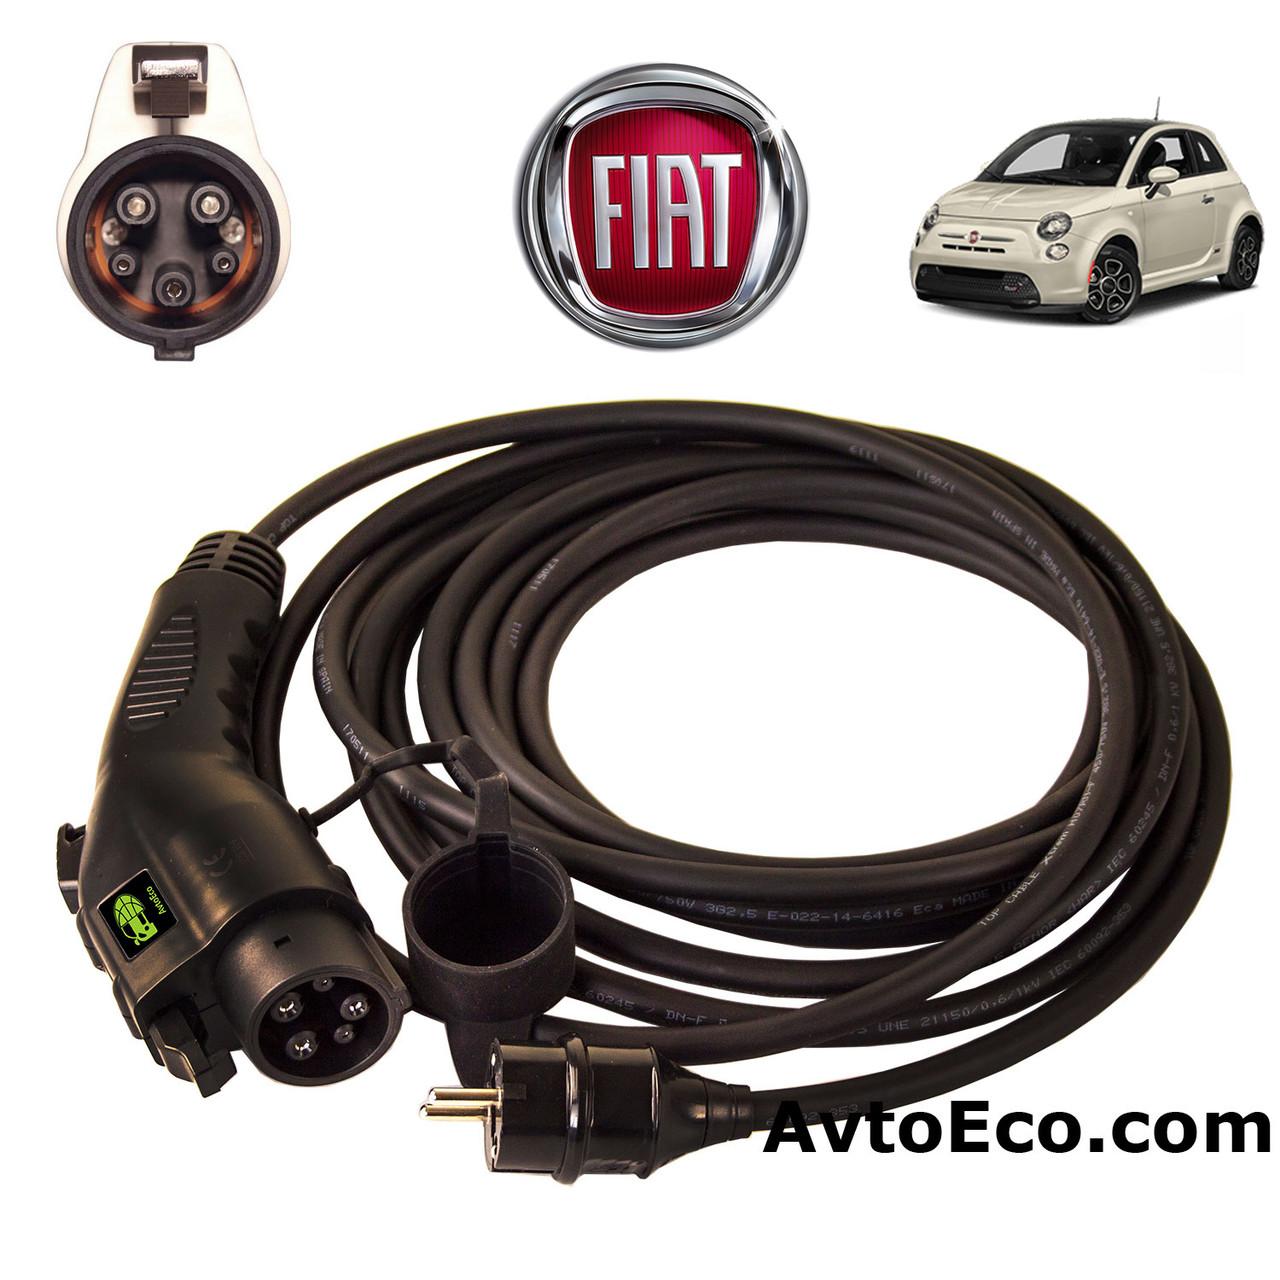 Зарядное устройство для электромобиля Fiat 500e AutoEco J1772-16A